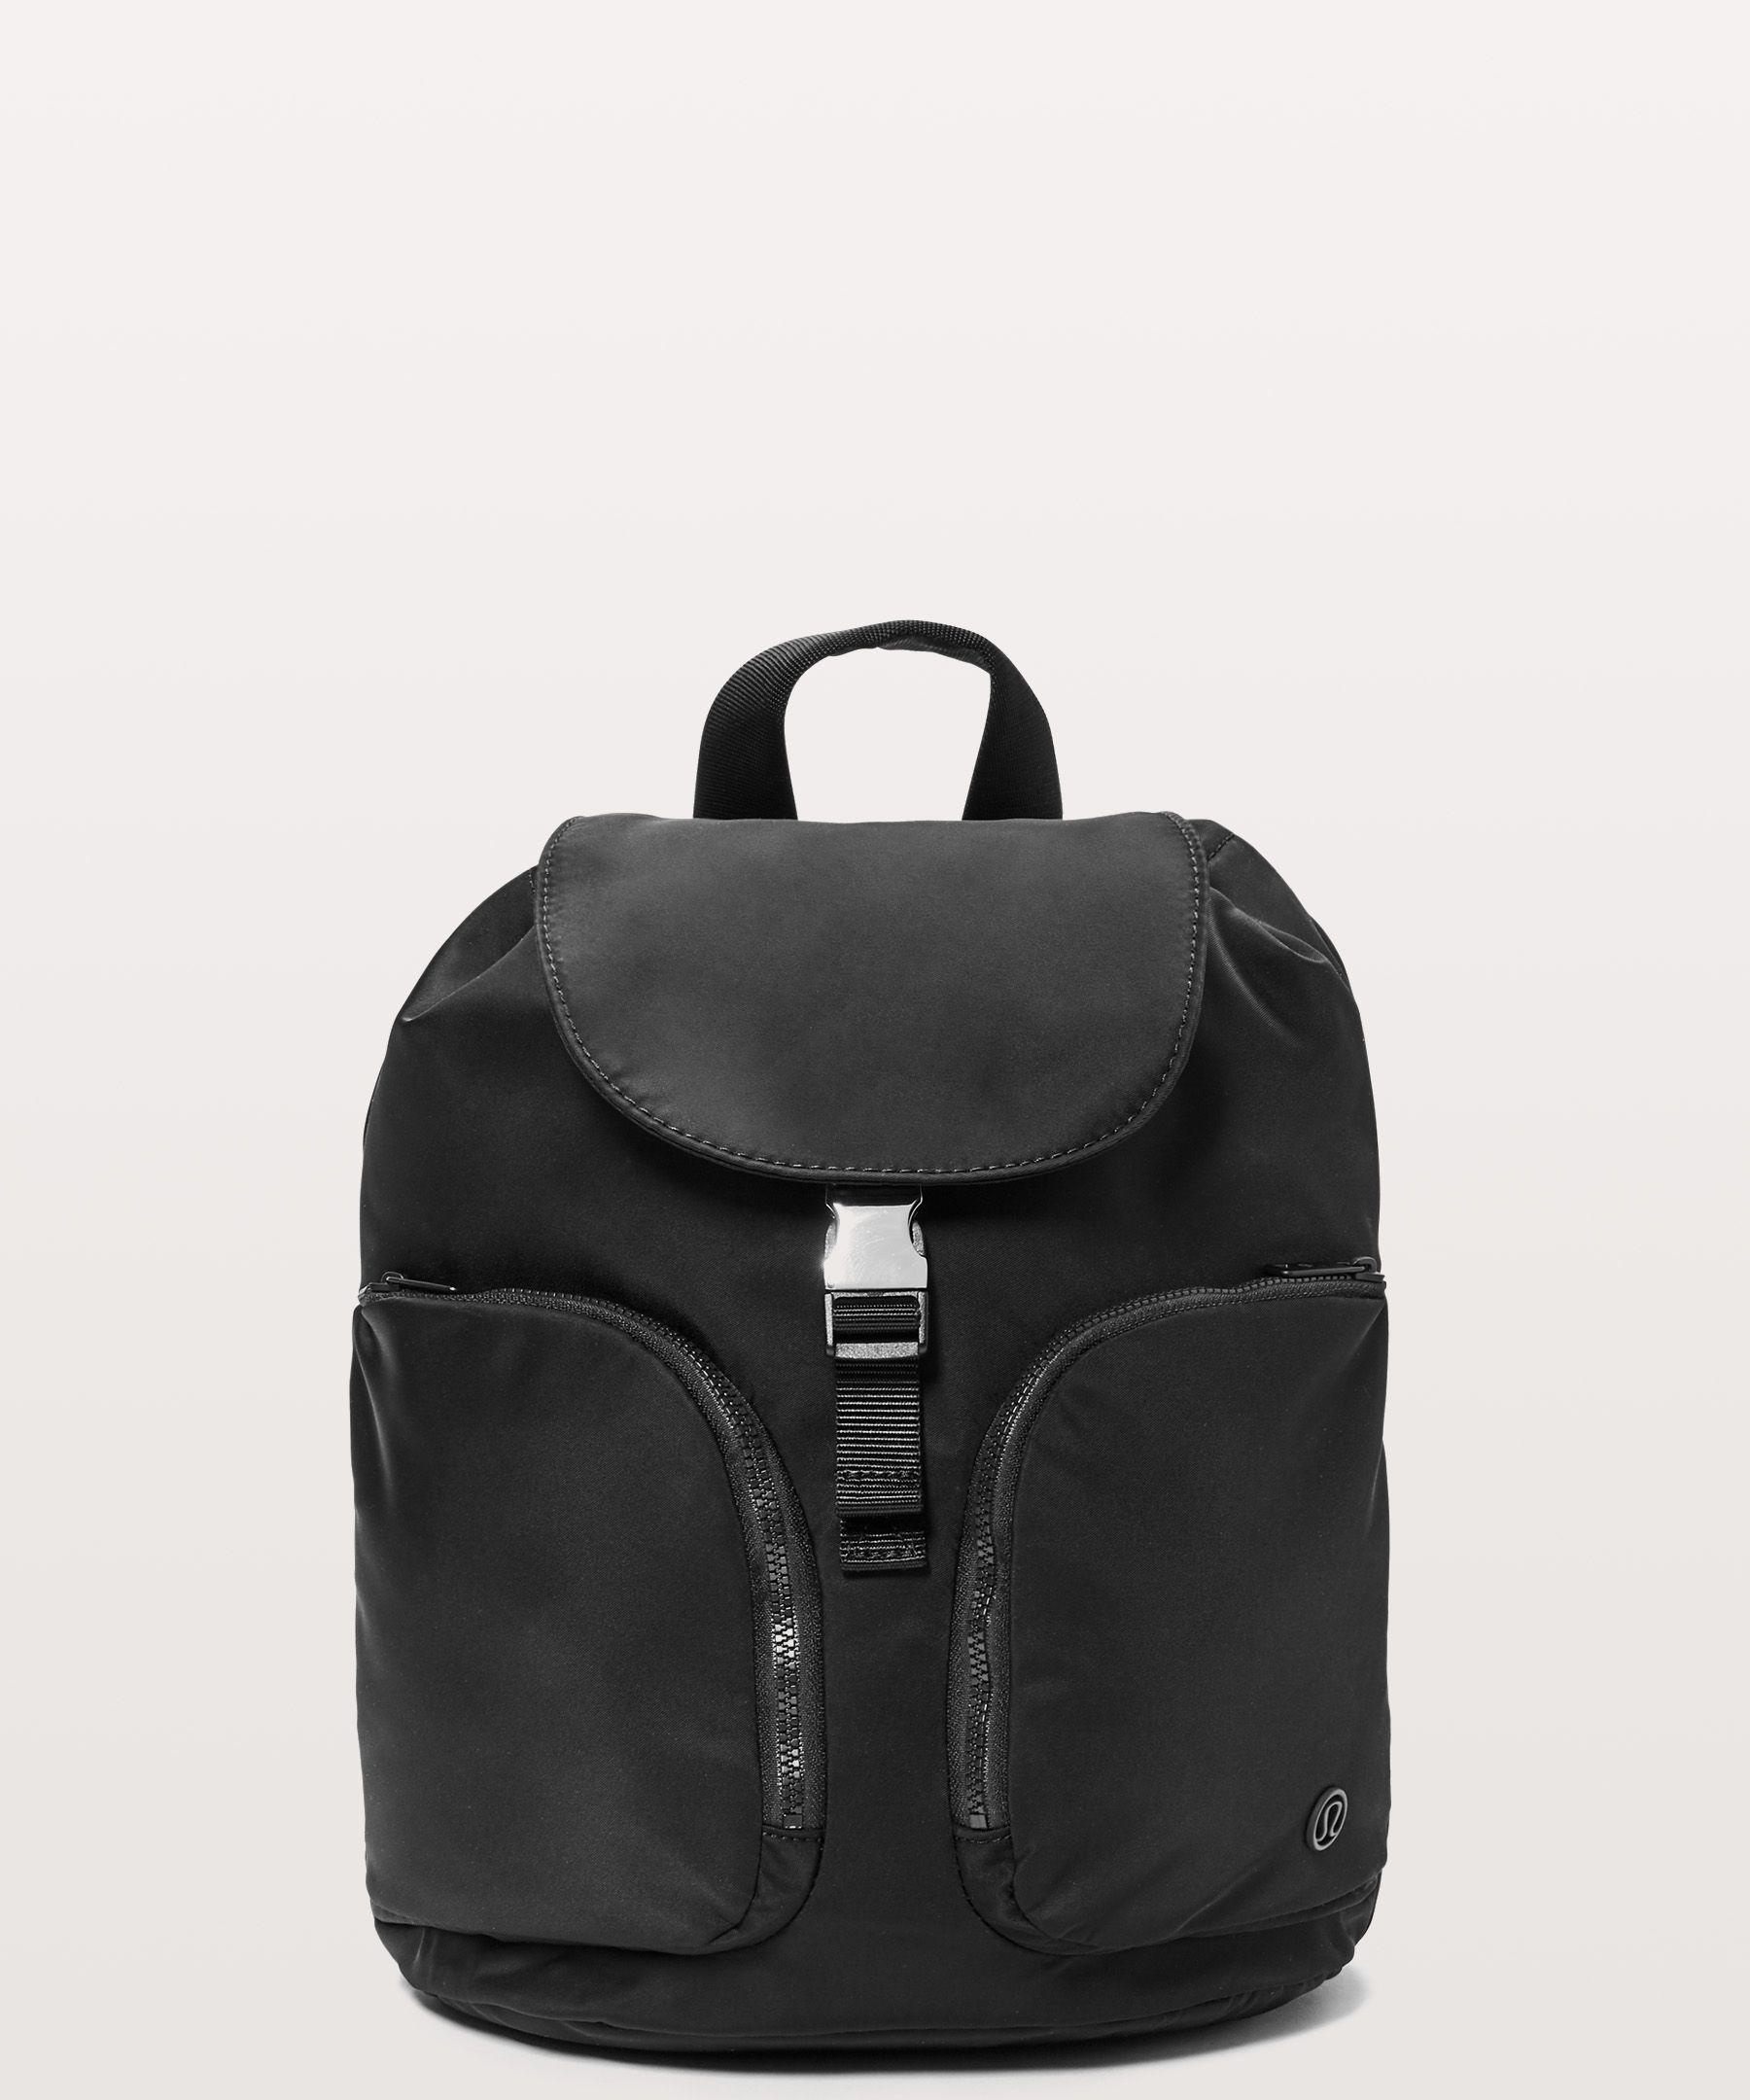 Carry Onward Rucksack Mini 9l Women S Bags Lululemon